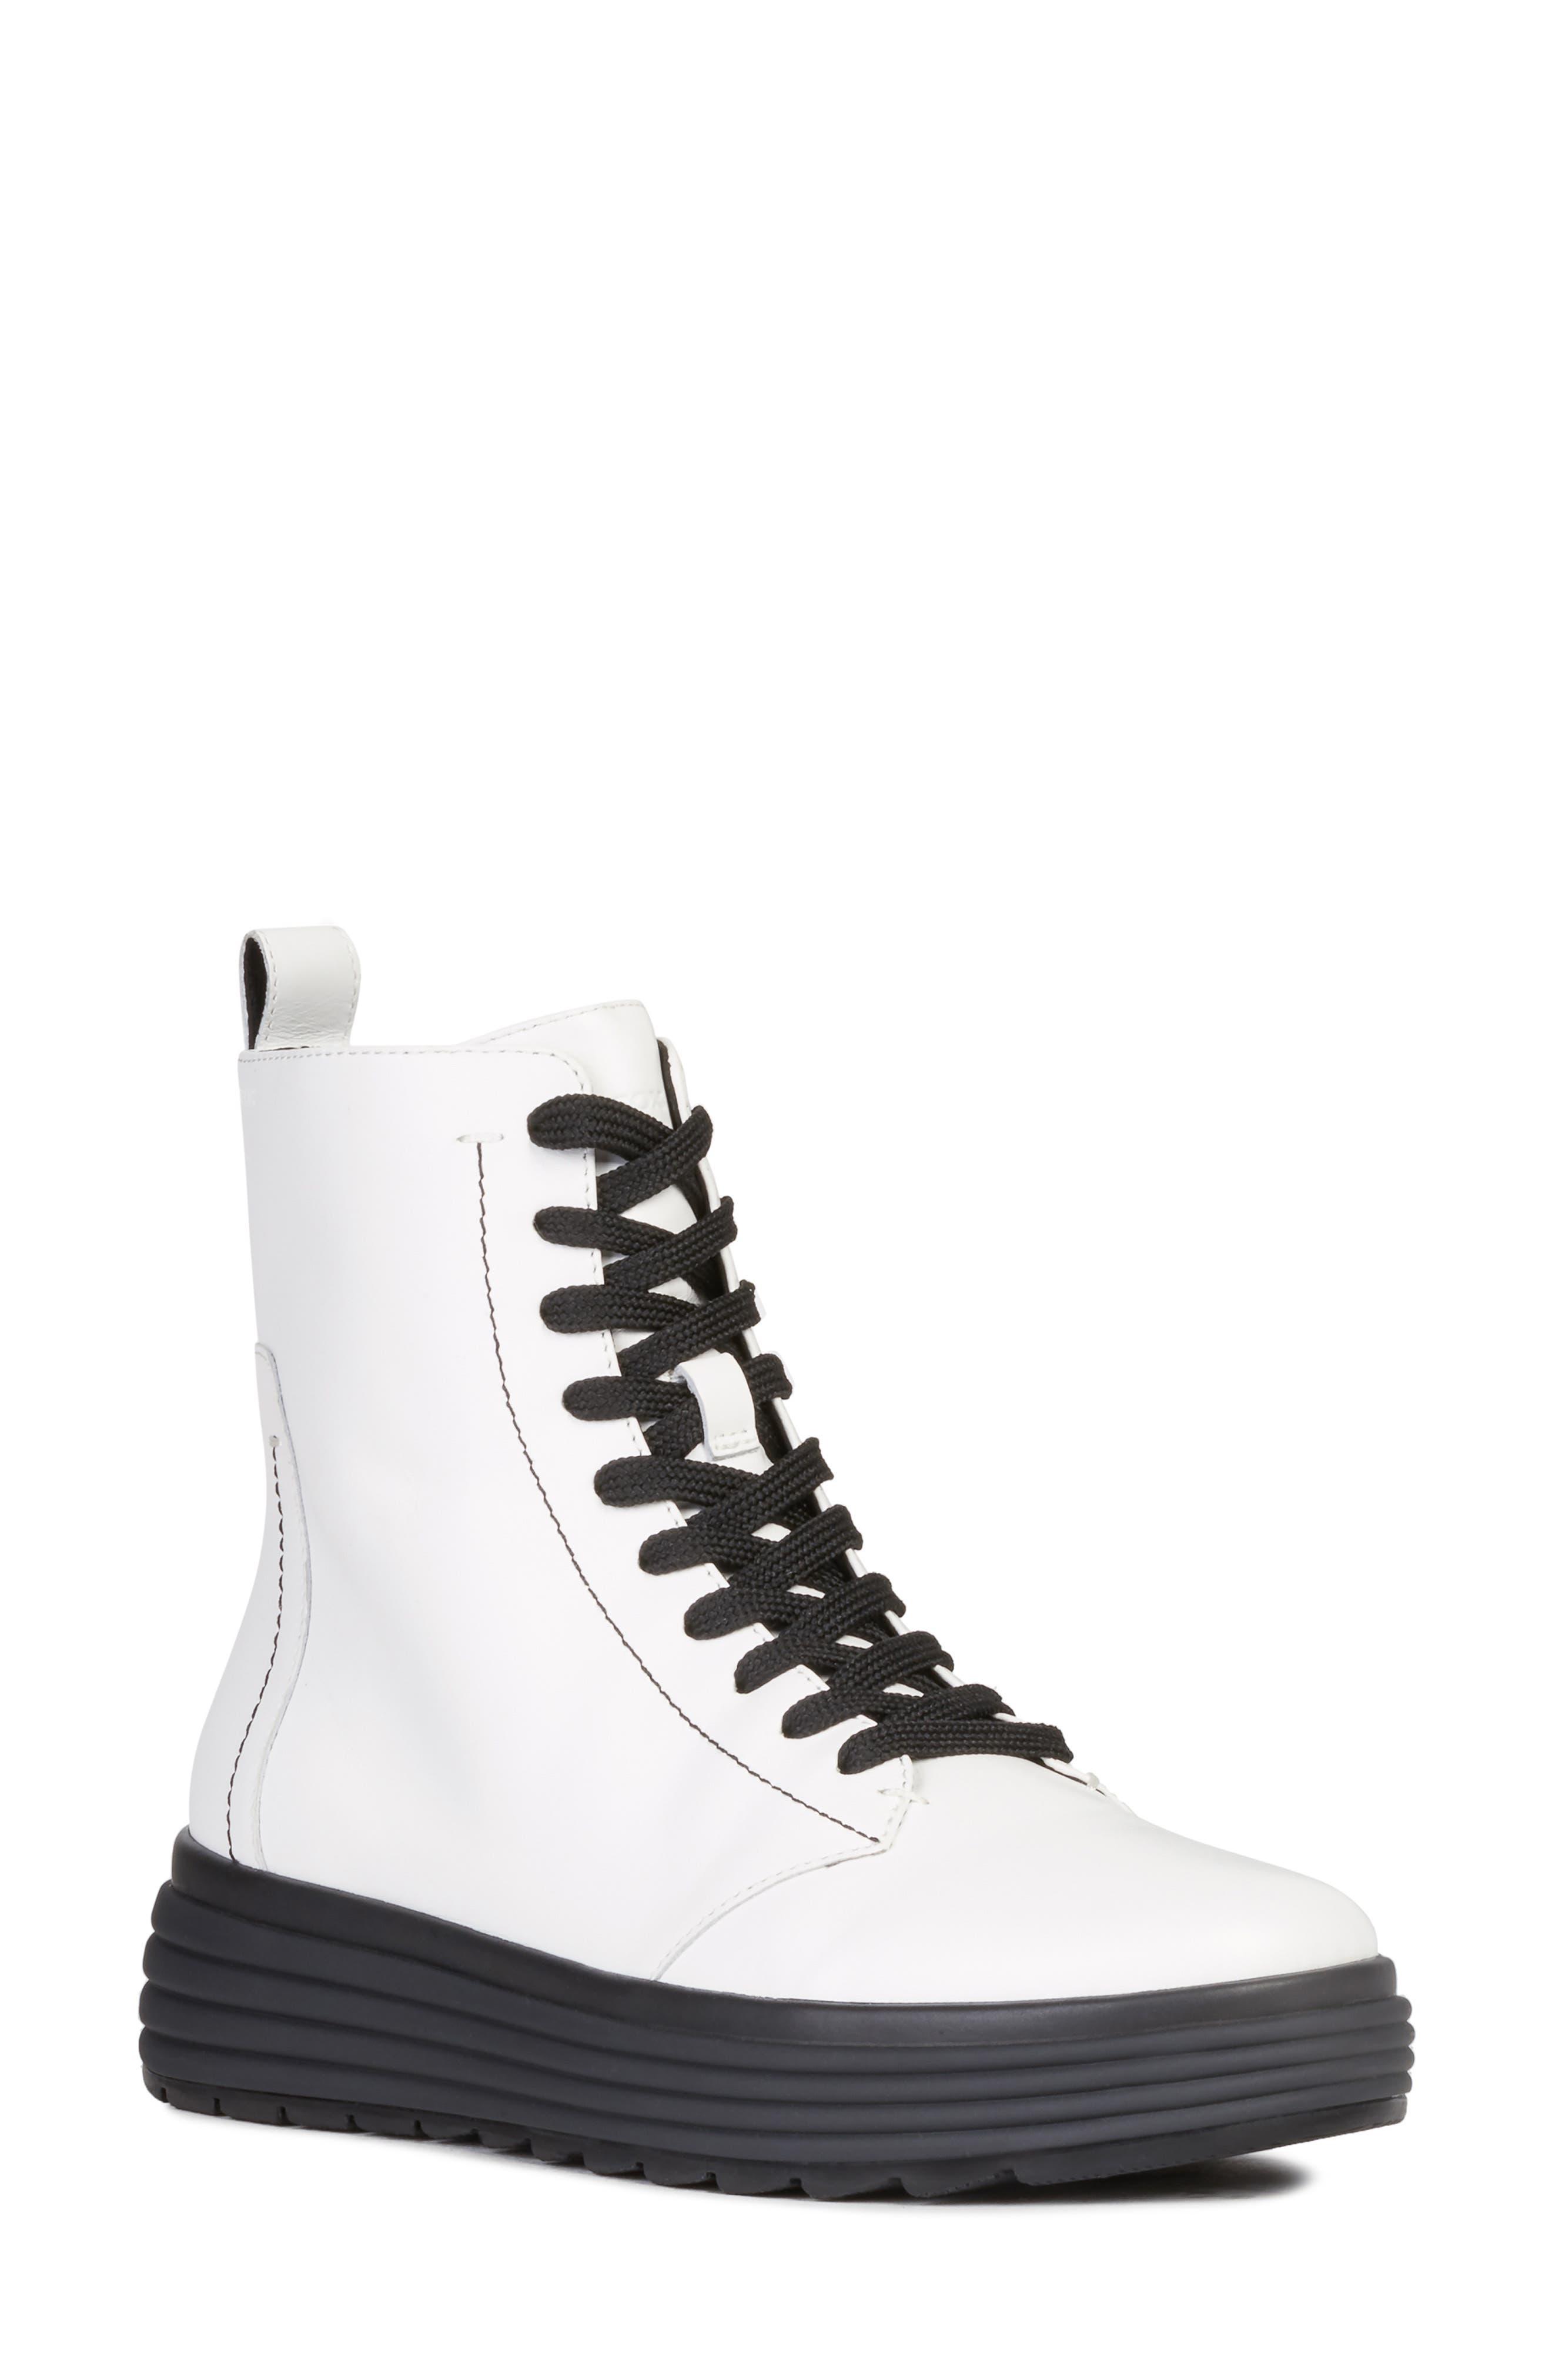 Geox Phaloae Boot, White